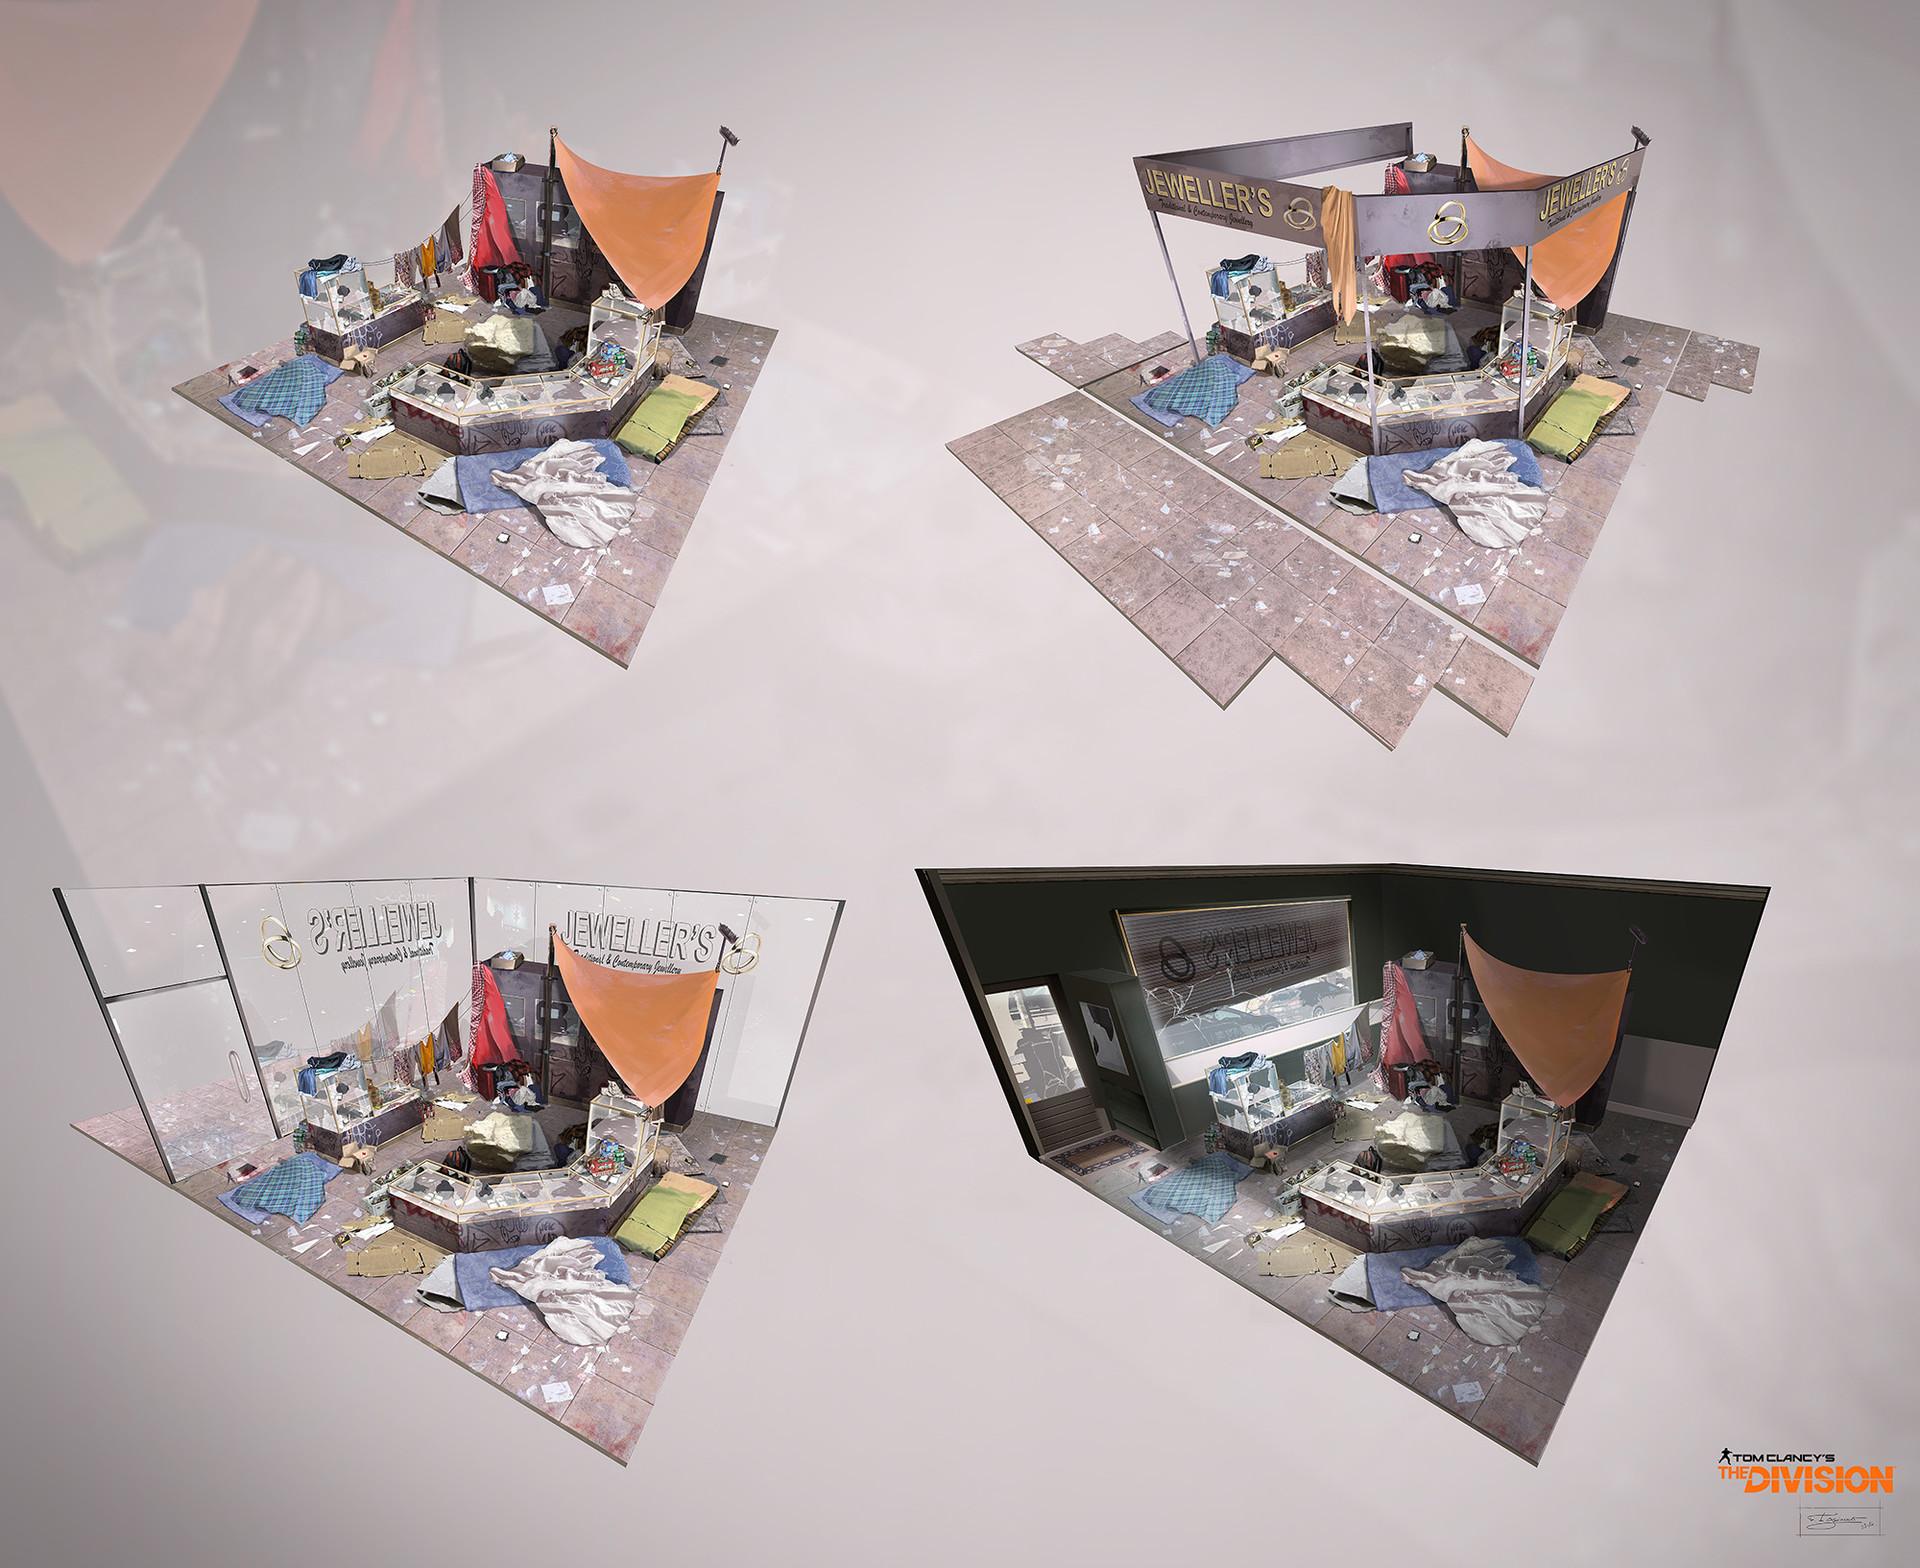 The Division Concept Art